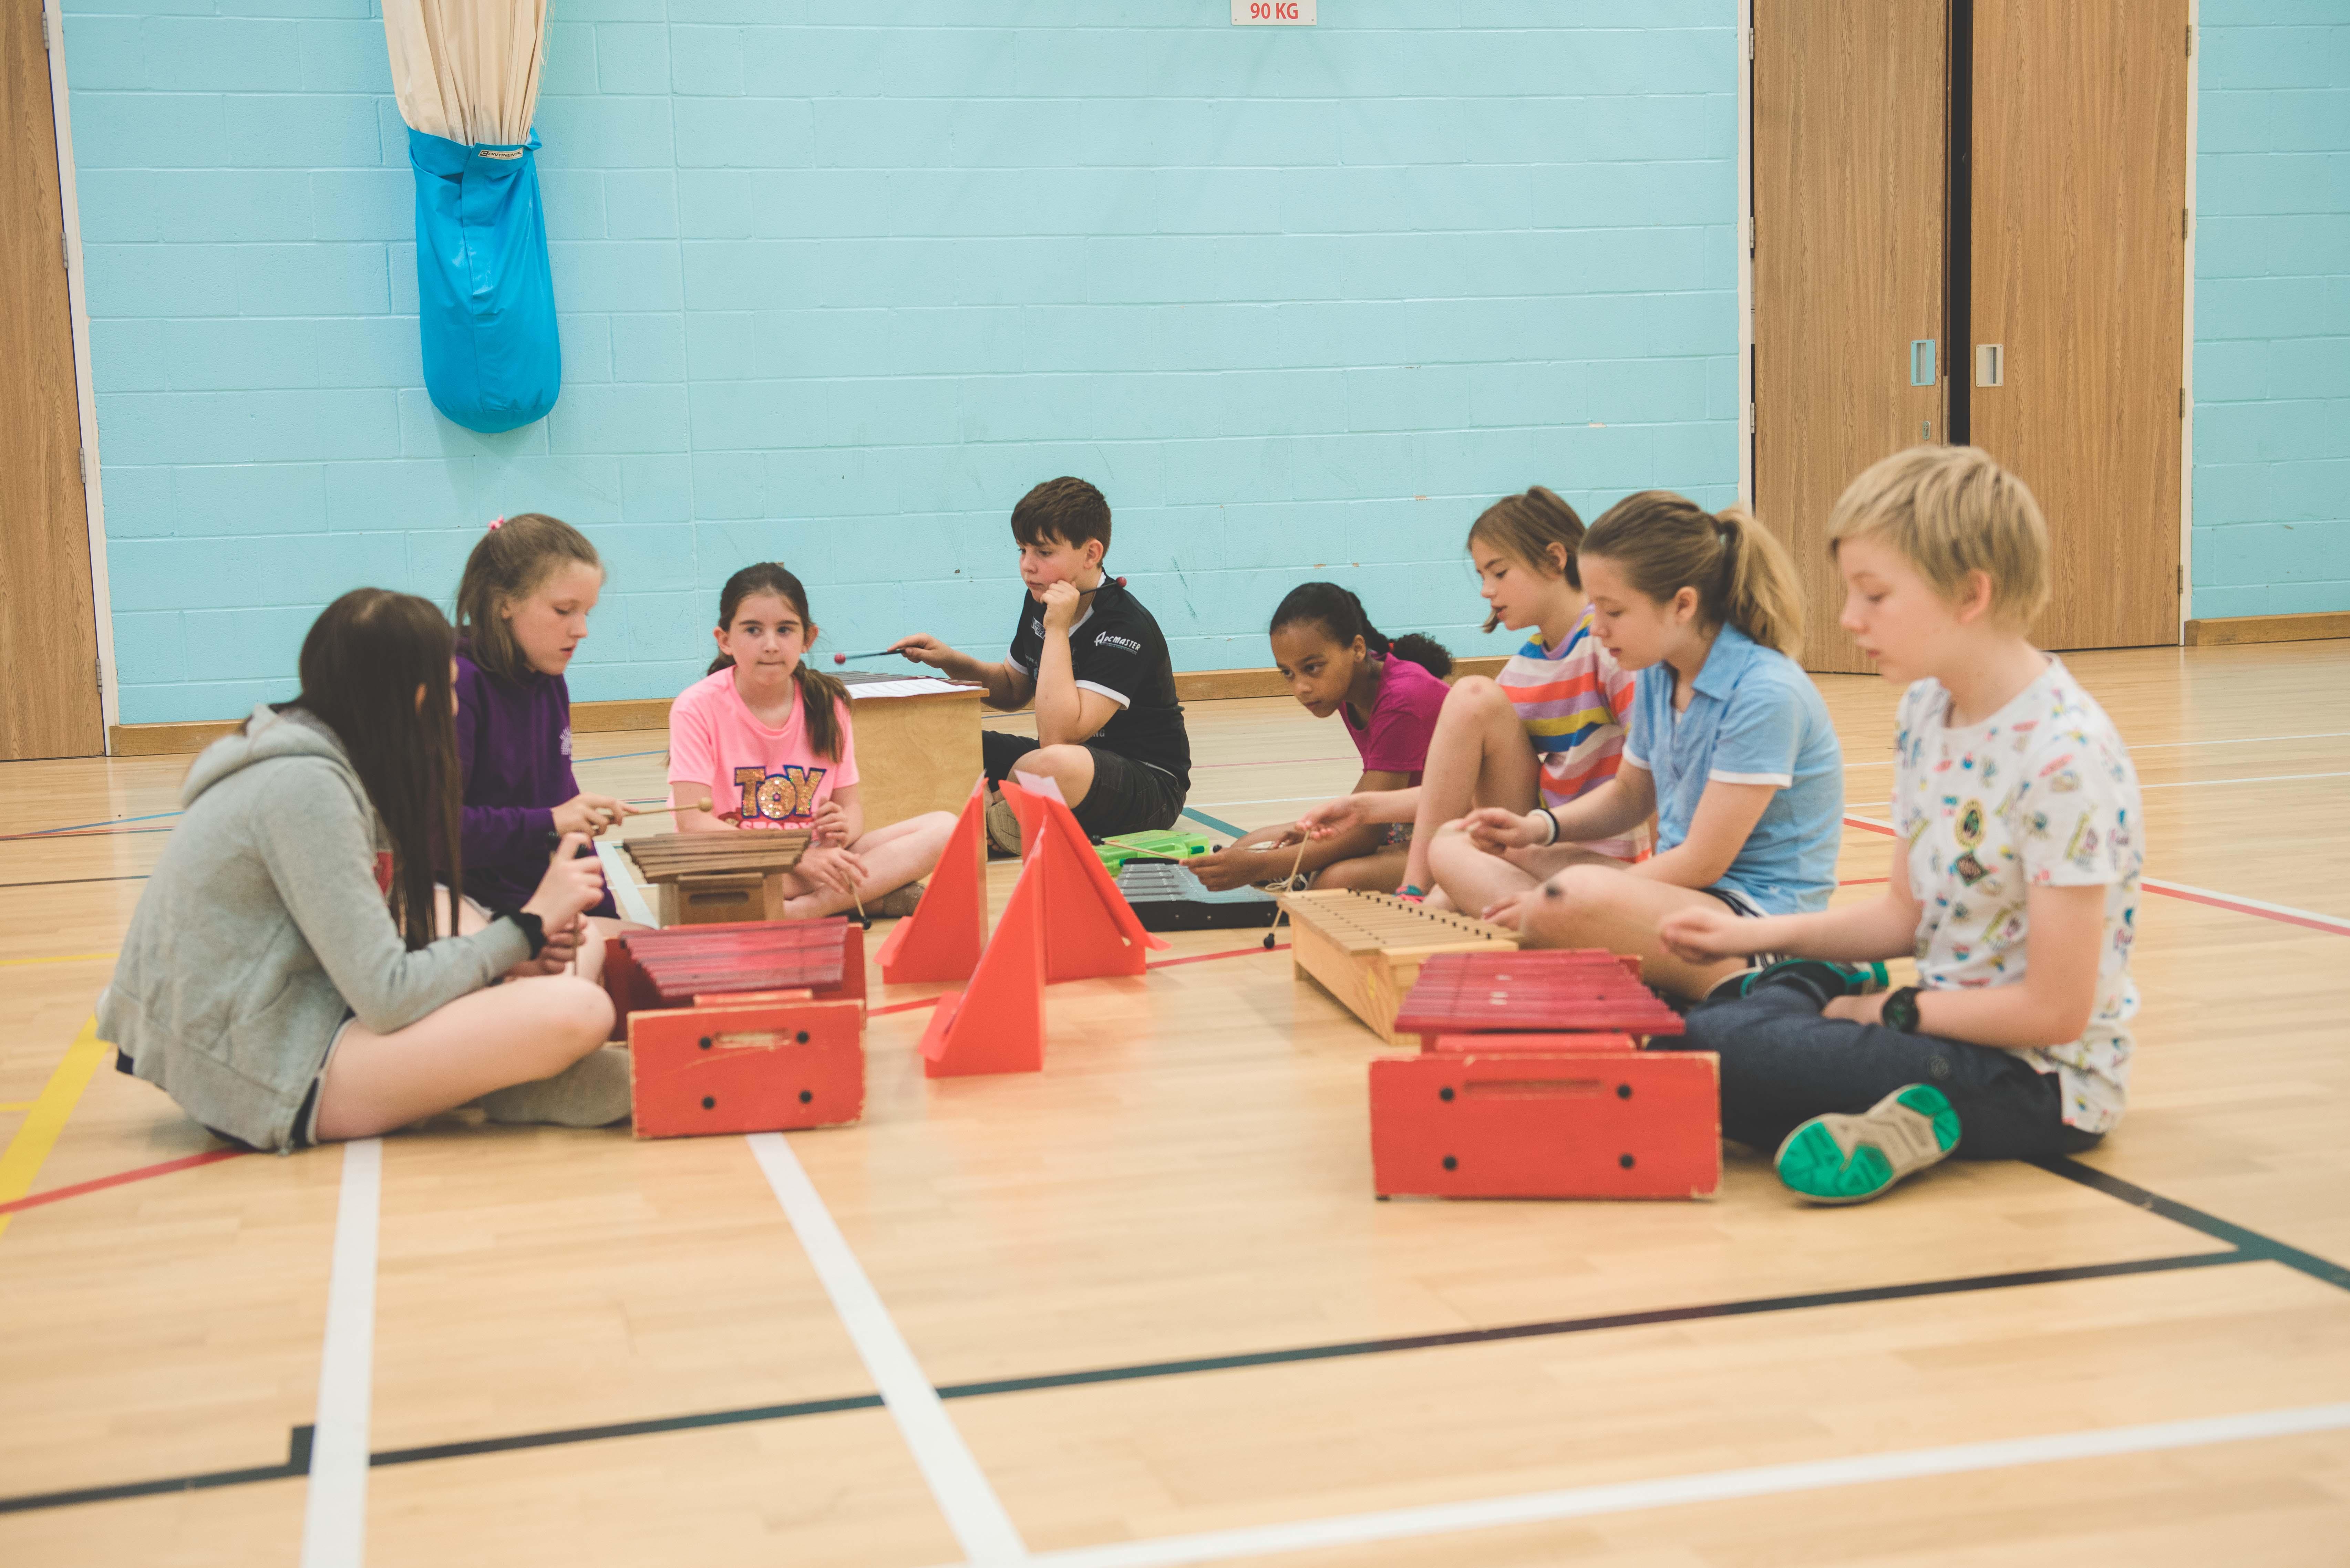 group of 7 summer school students practising xylophone